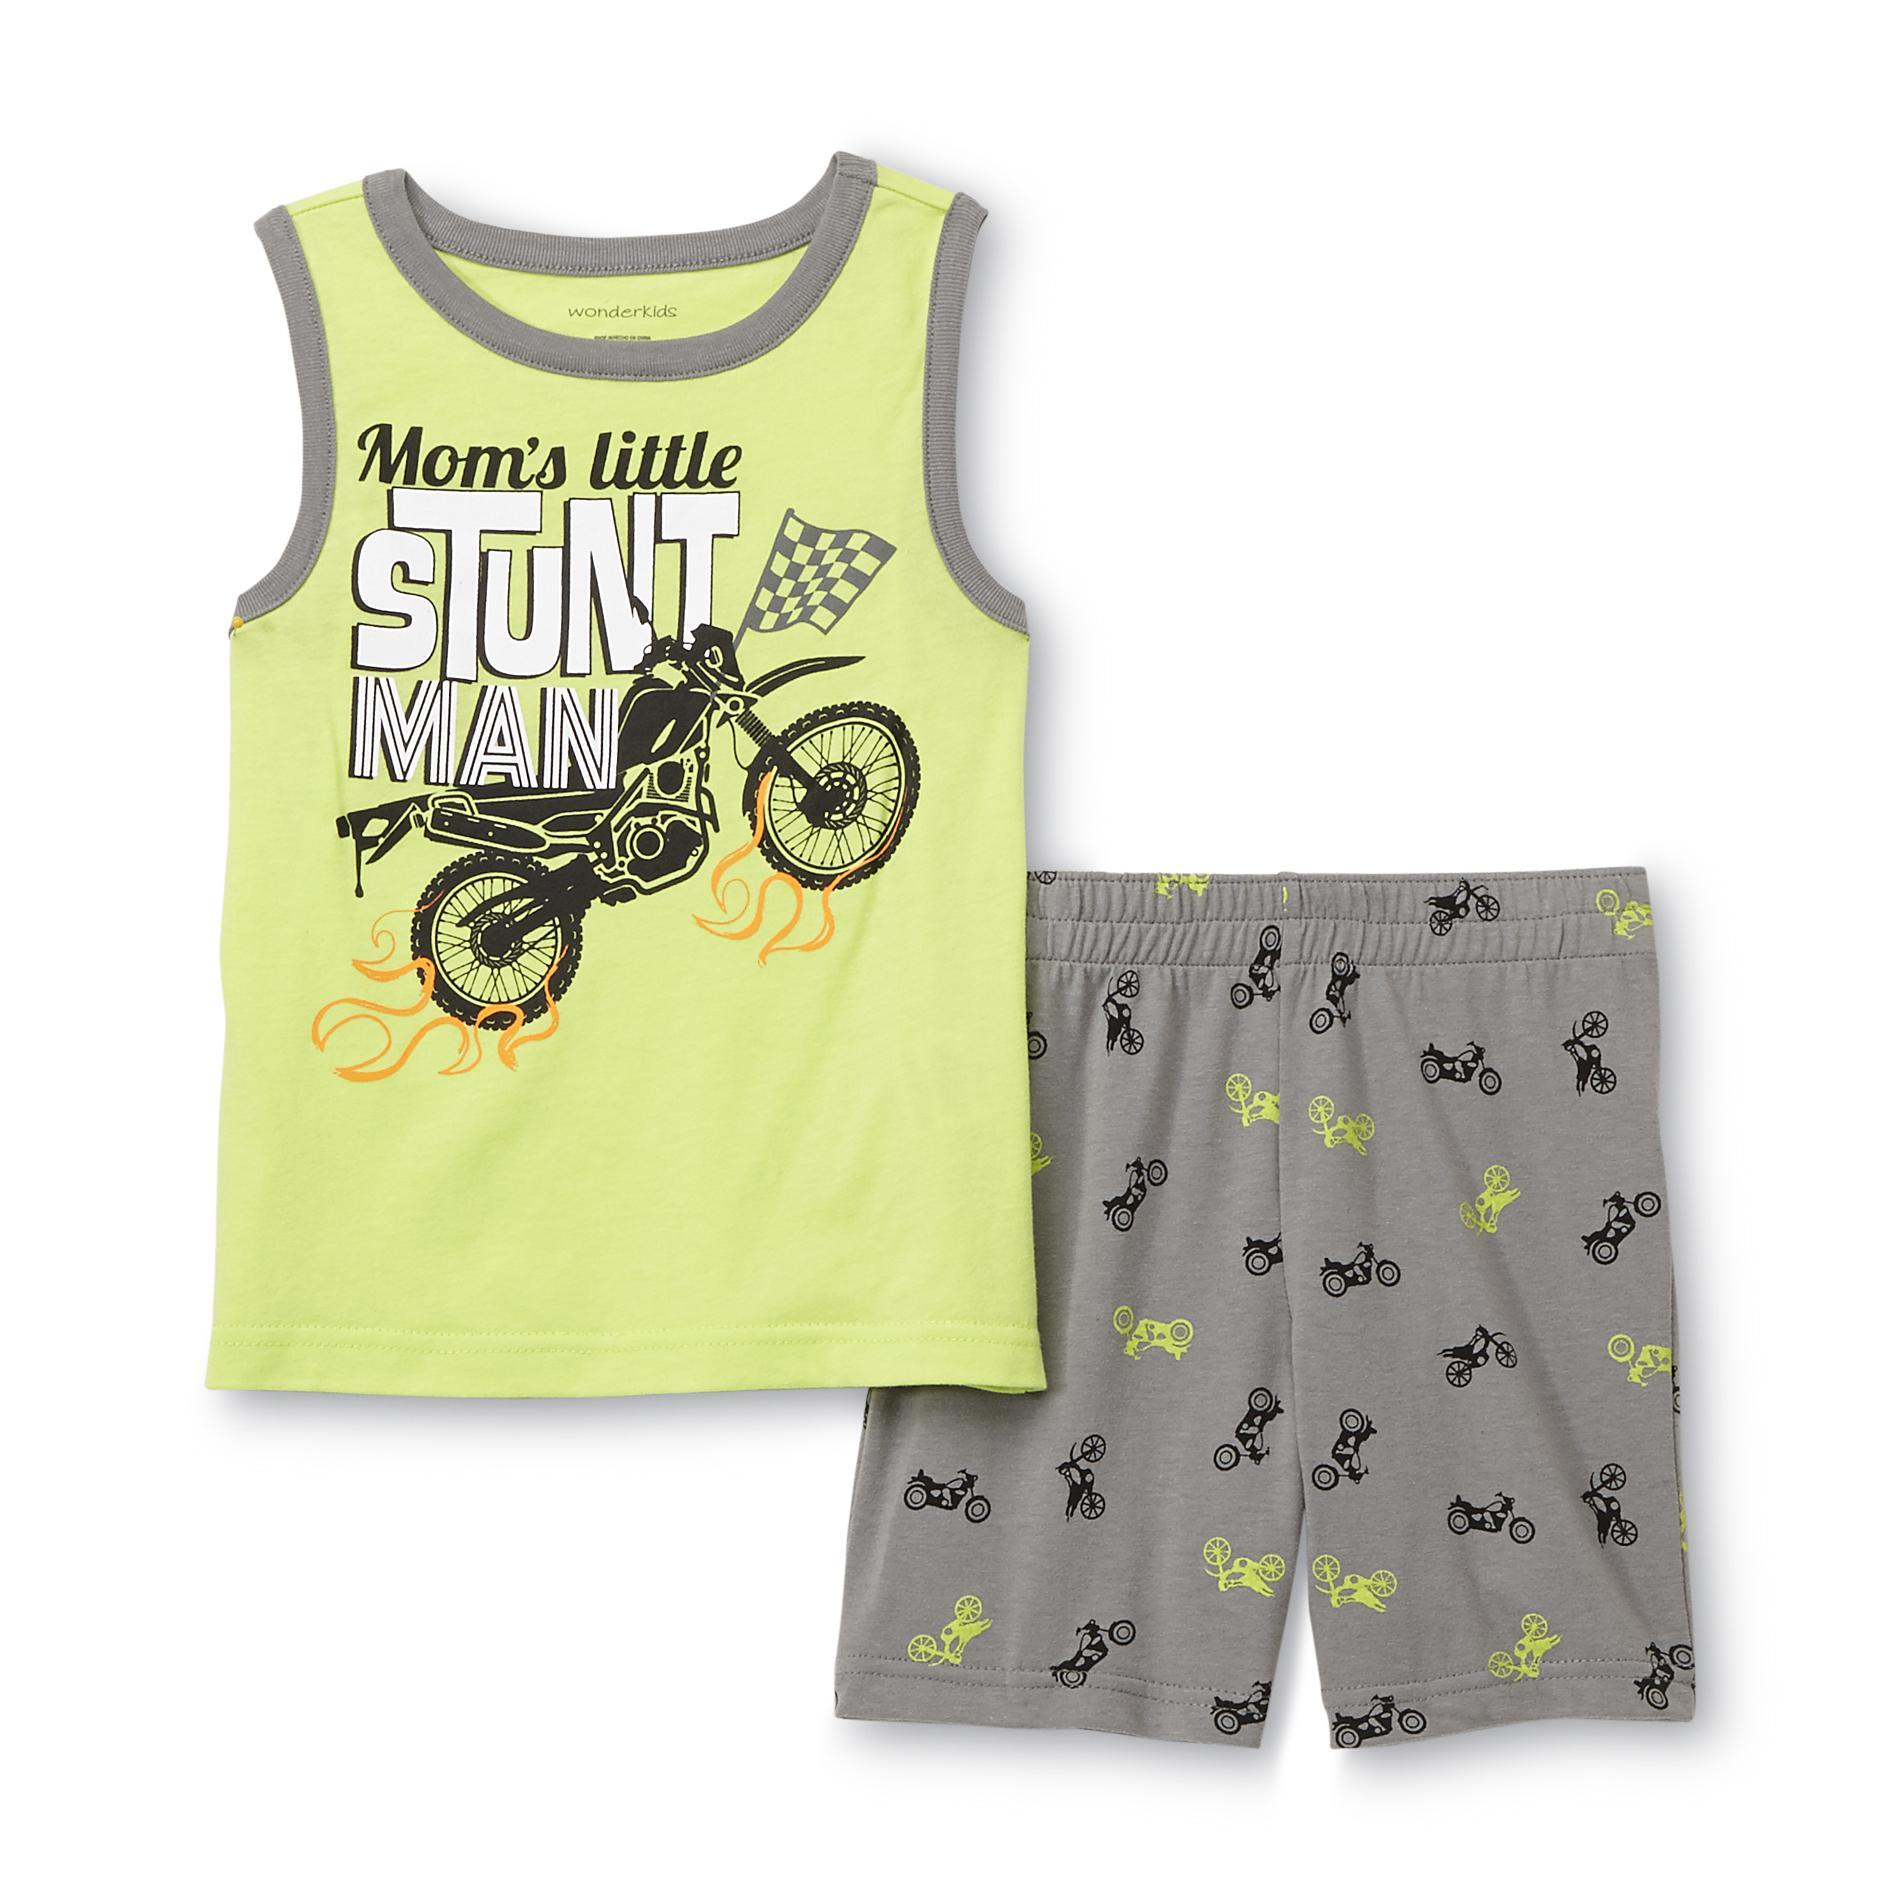 WonderKids Toddler Boy's Graphic Tank Top & Shorts - Dirt Bike